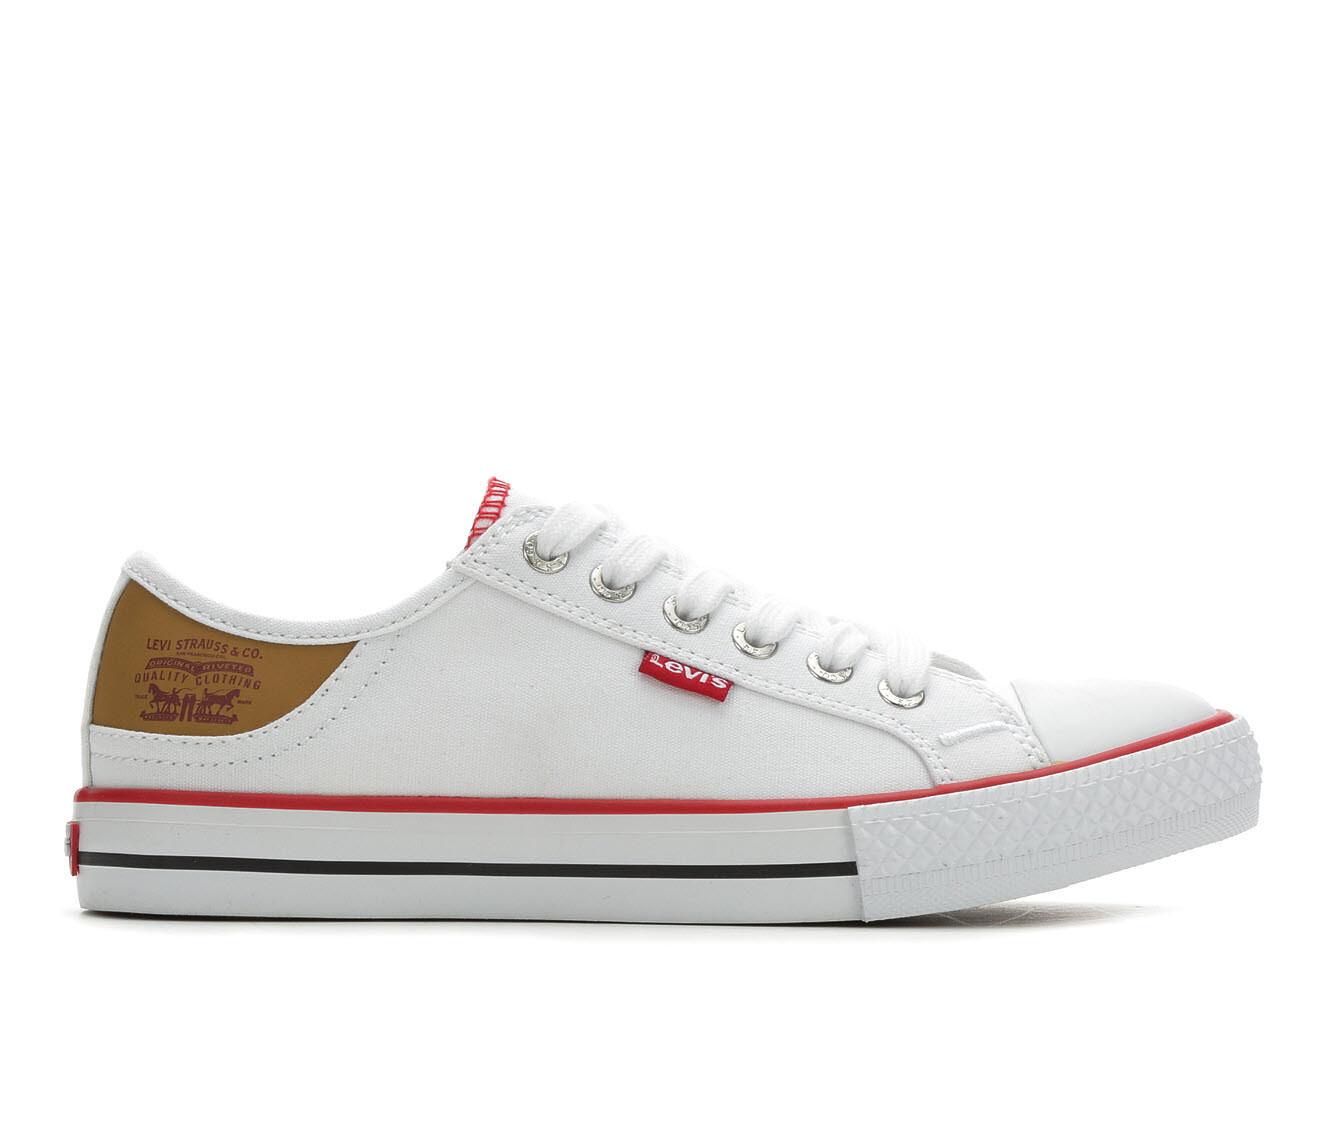 special sales Women's Levis Stan Buck Sneakers White/Brown